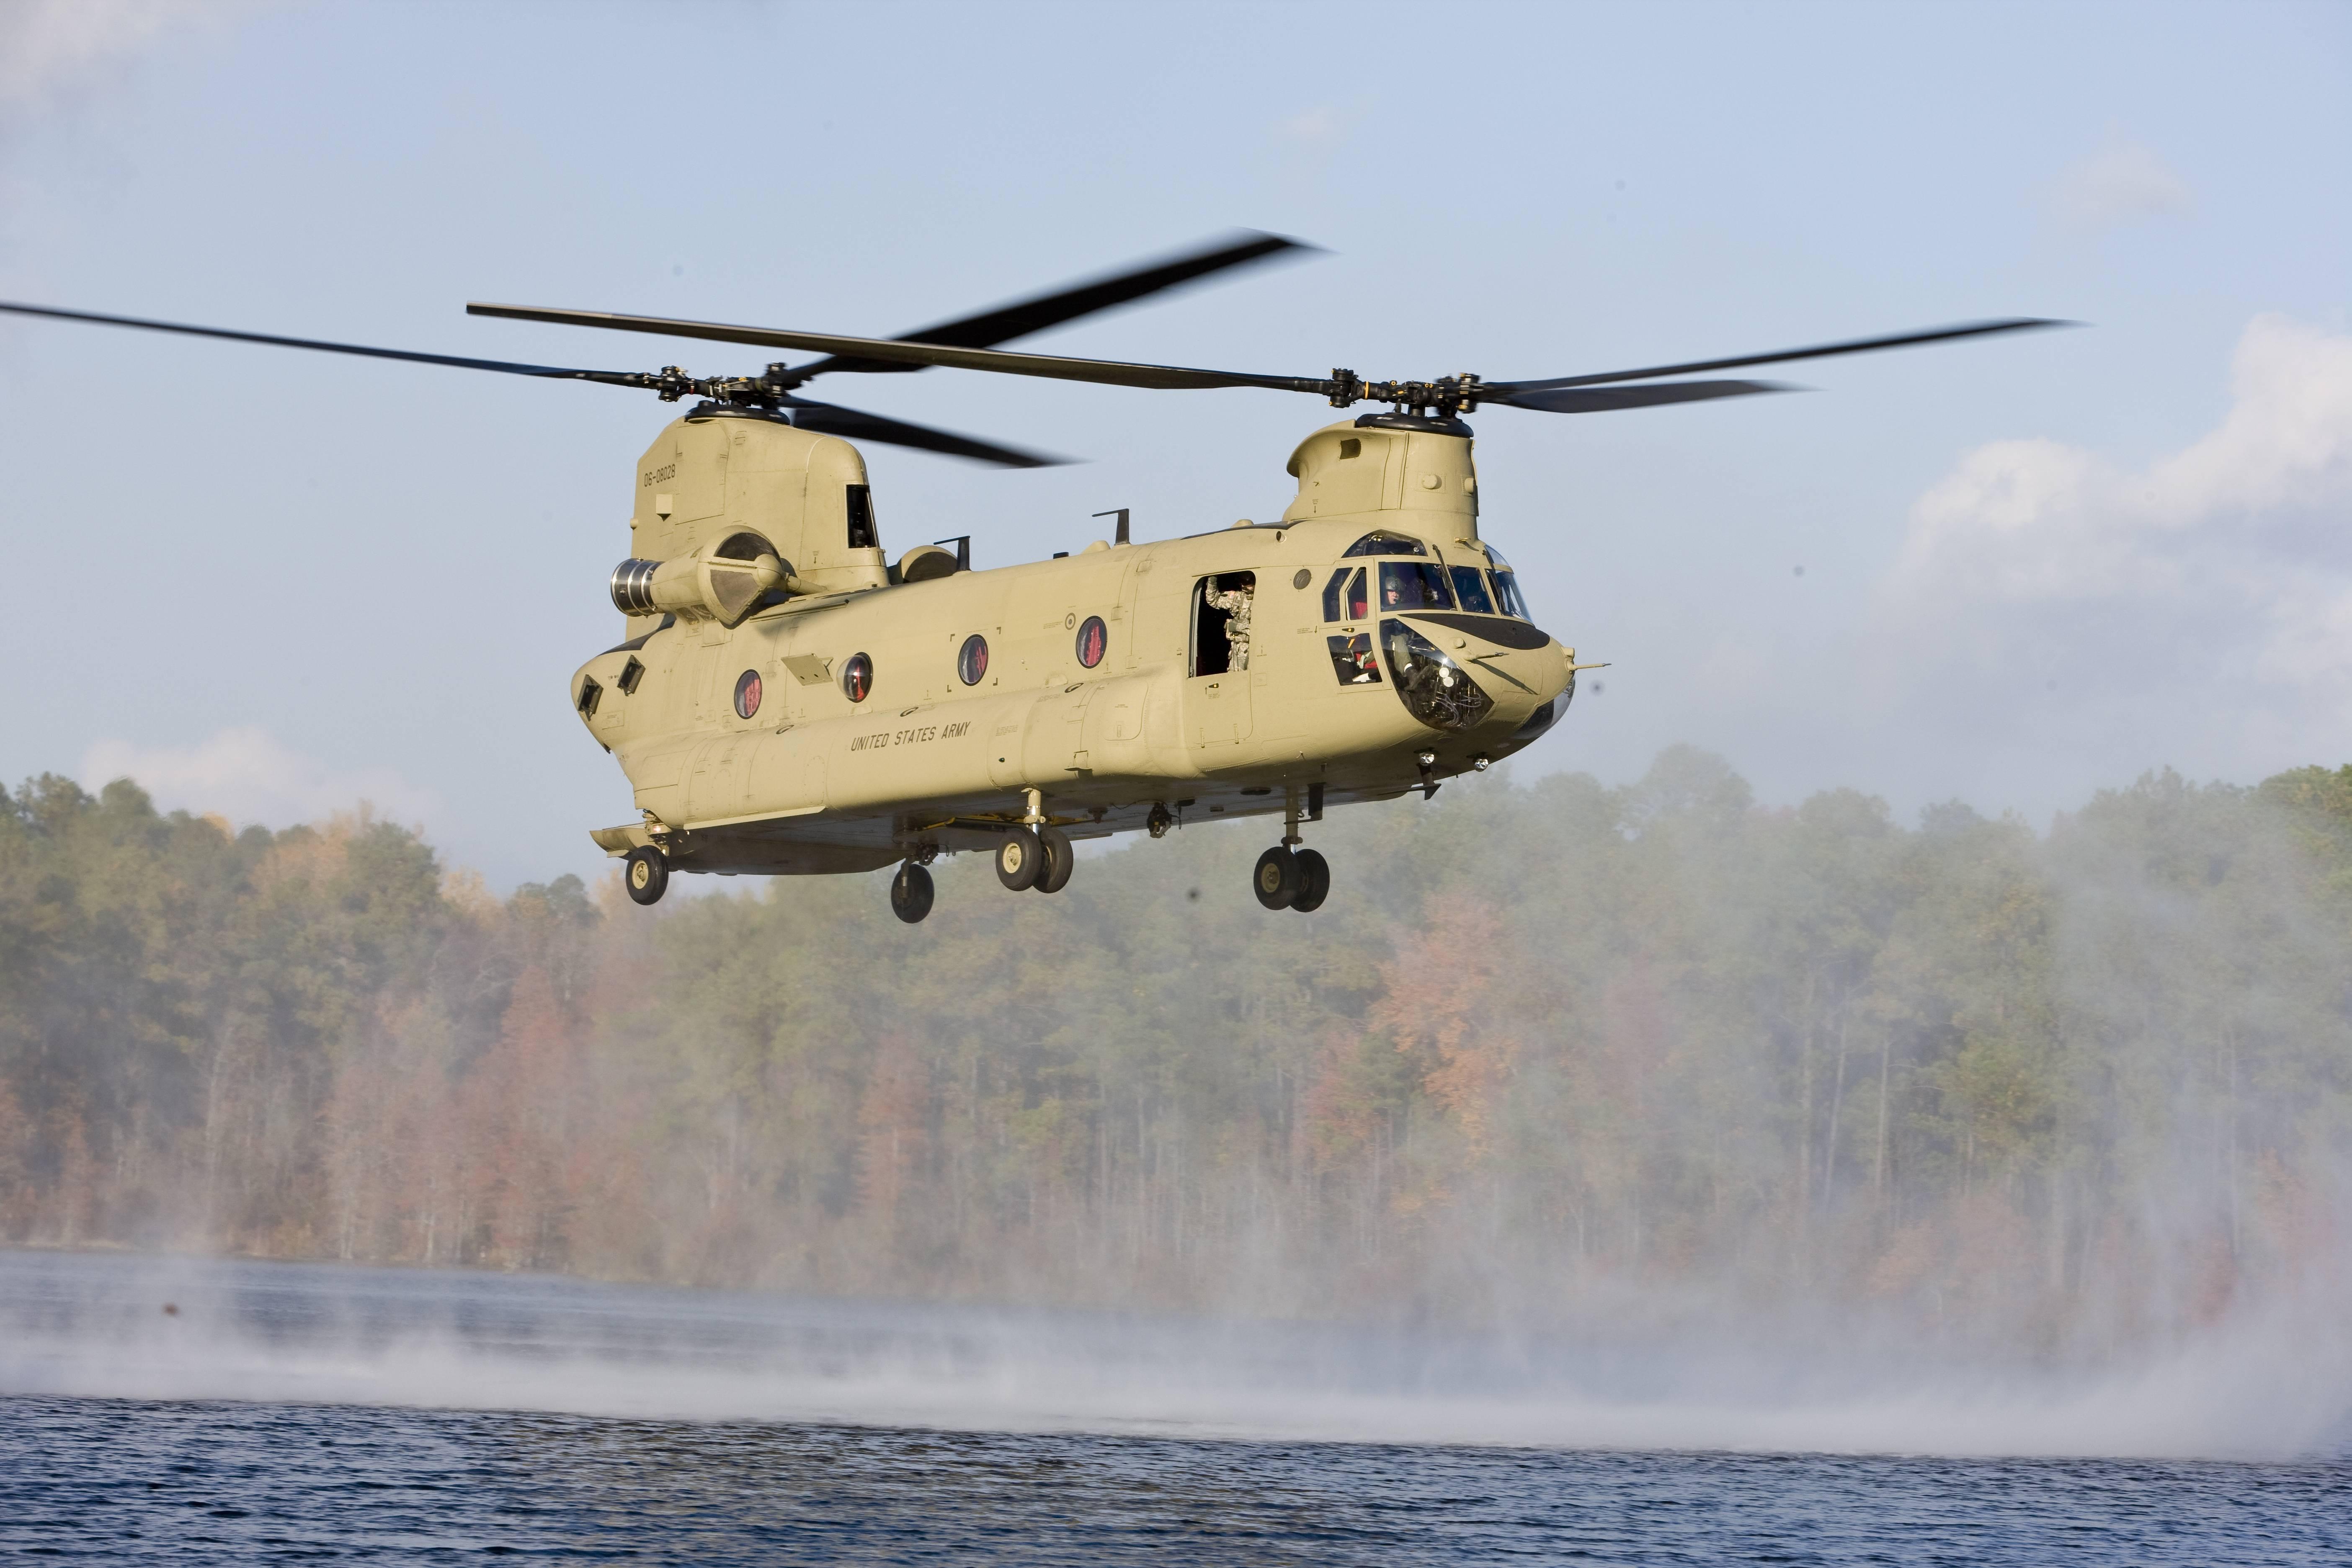 Транспортный вертолет boeing-vertol ch-47 chinook: «чинук» — «летающий вагон»